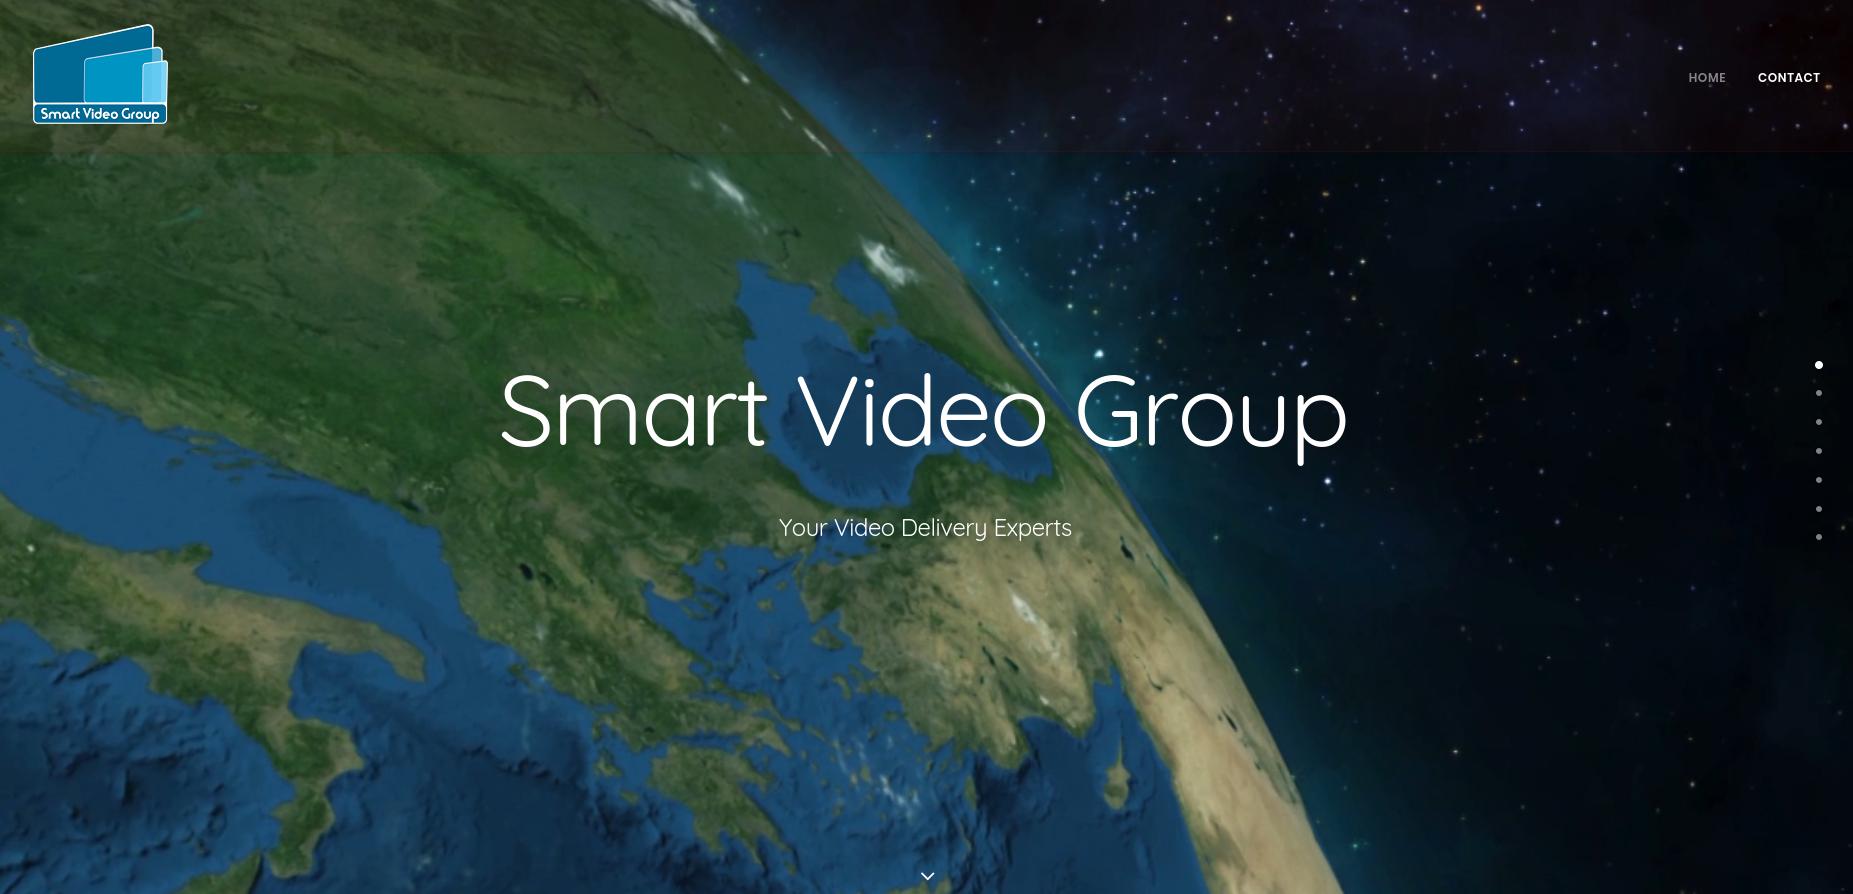 Web-Design für Smartvideogroup